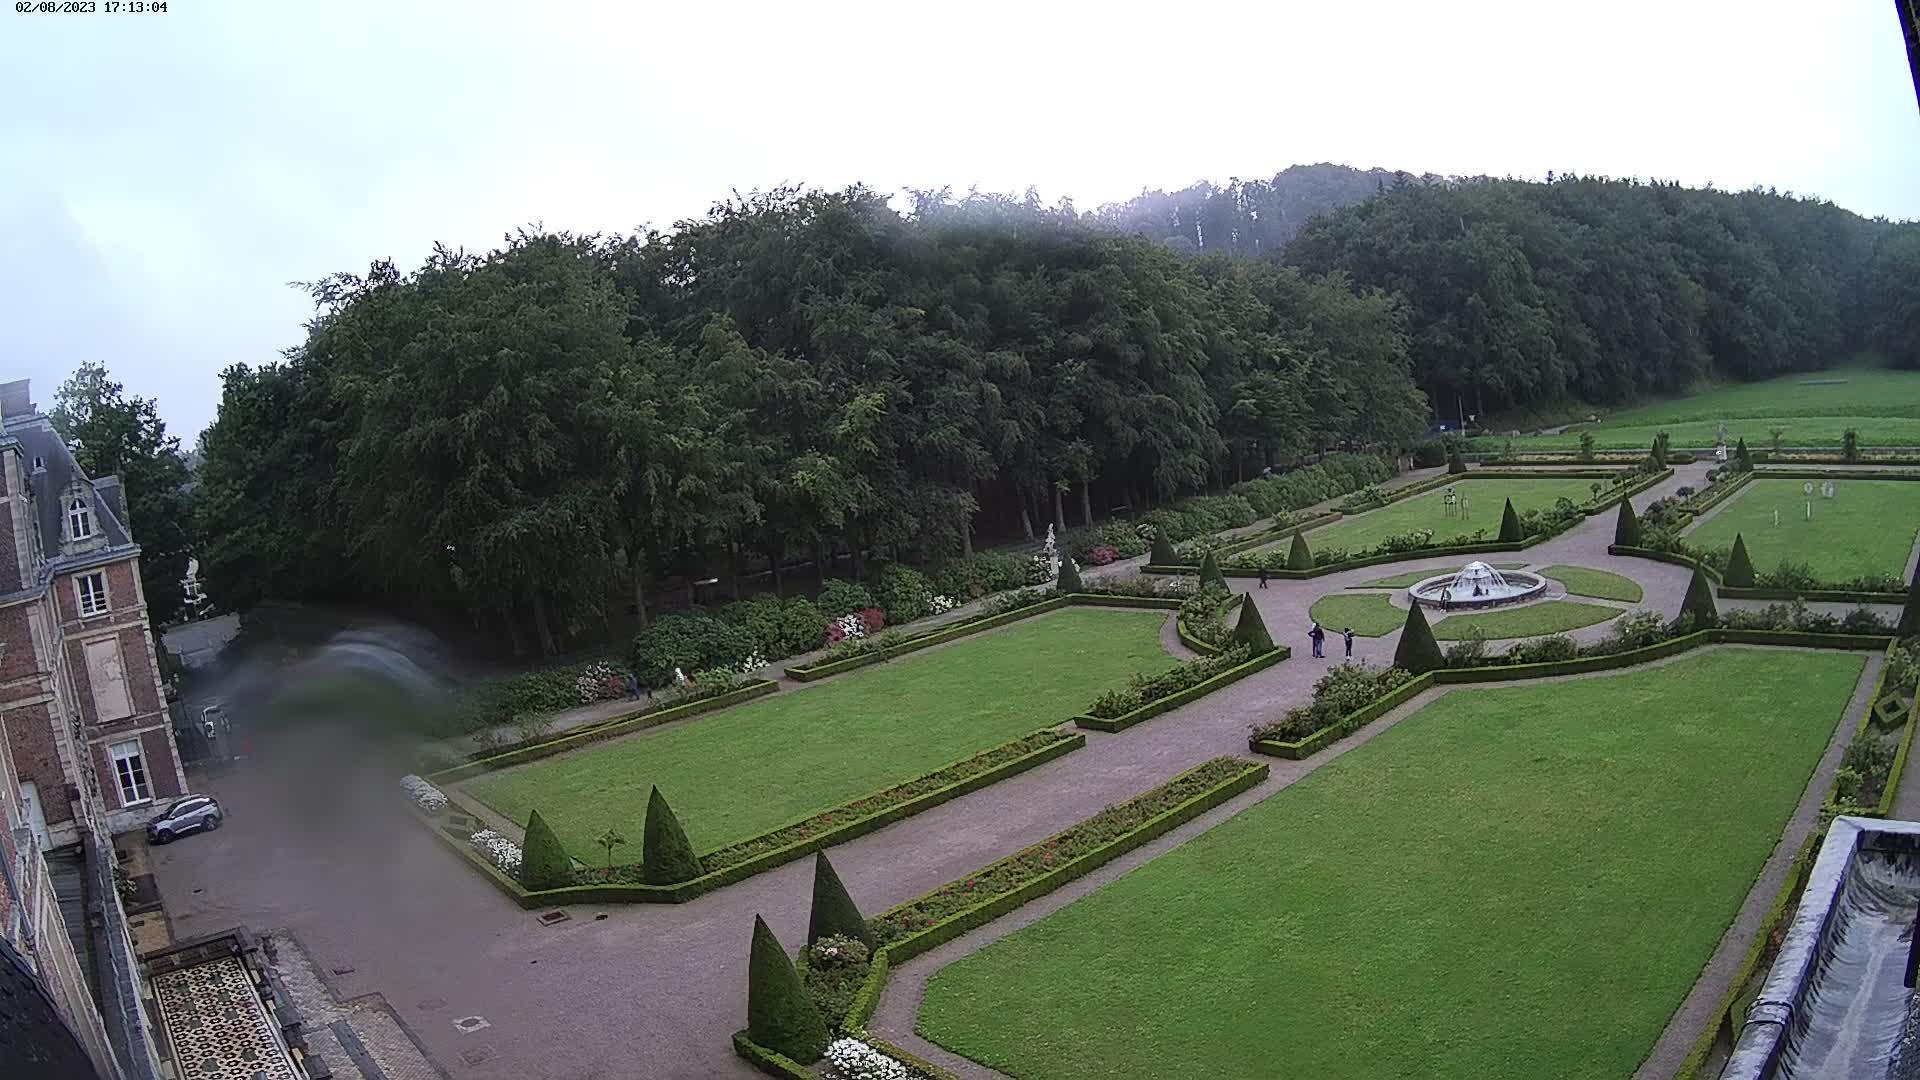 Webkamera Eu: Parc et Roseraie